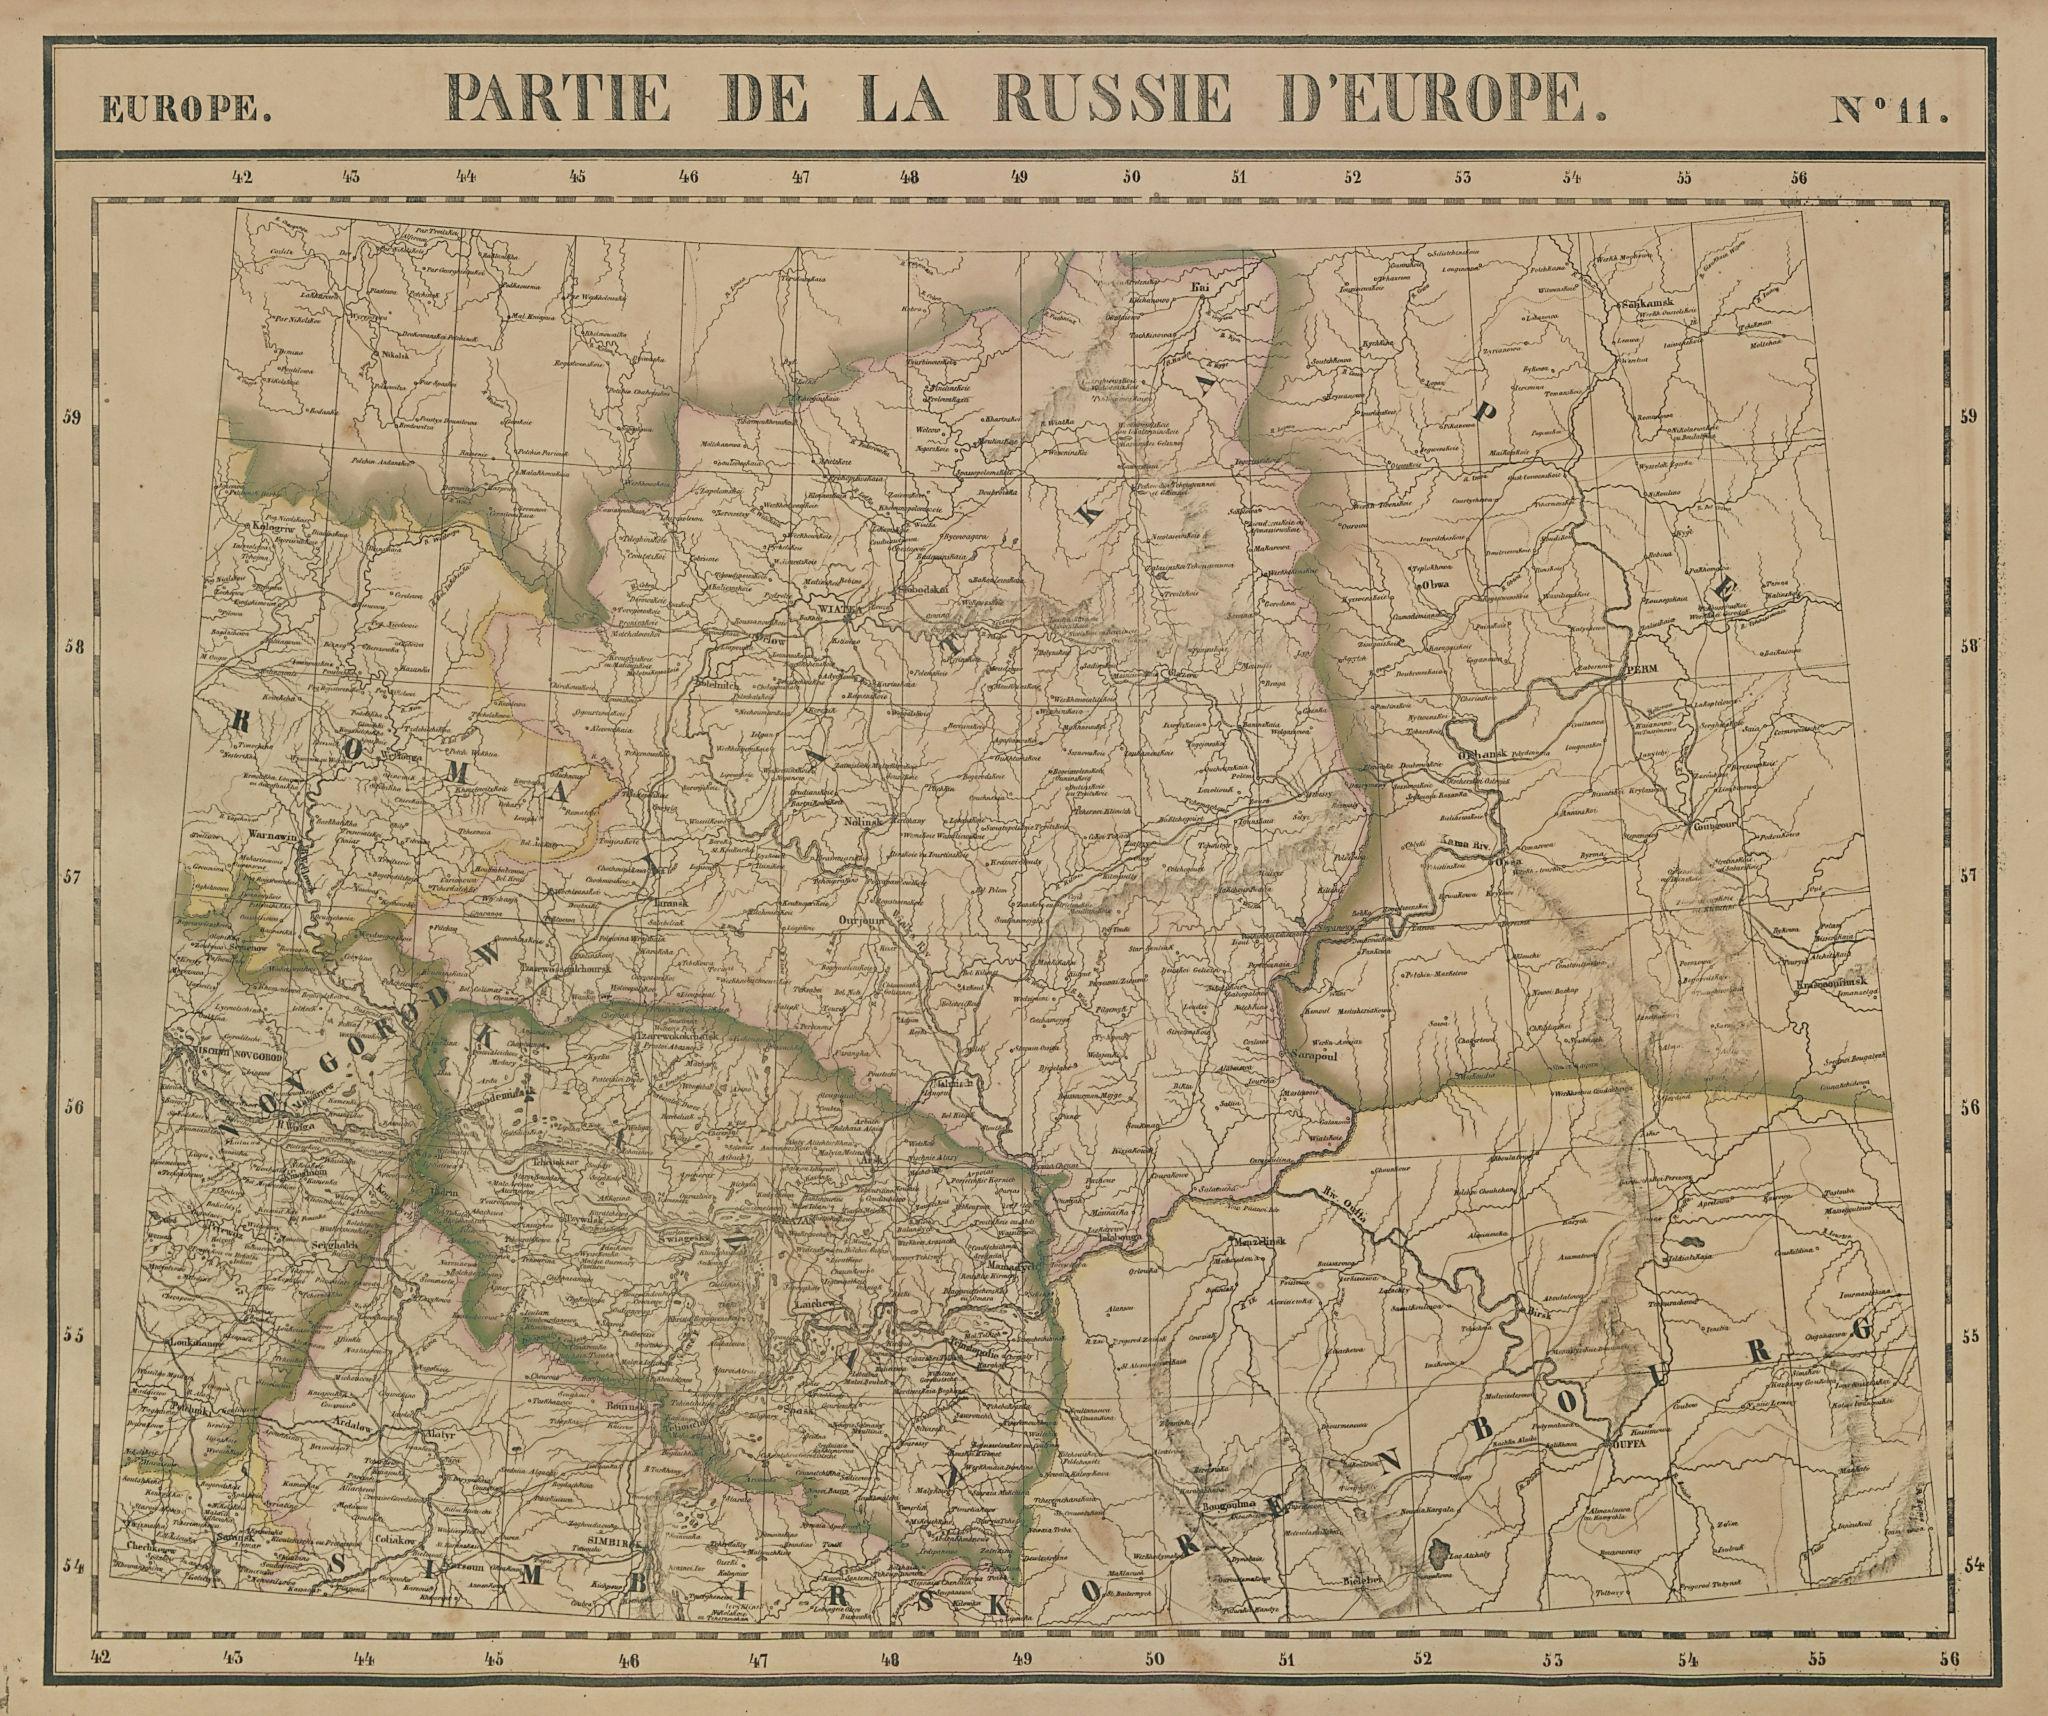 Russie d'Europe #11 Russia Kirov Perm Kazan Orenburg VANDERMAELEN 1827 old map